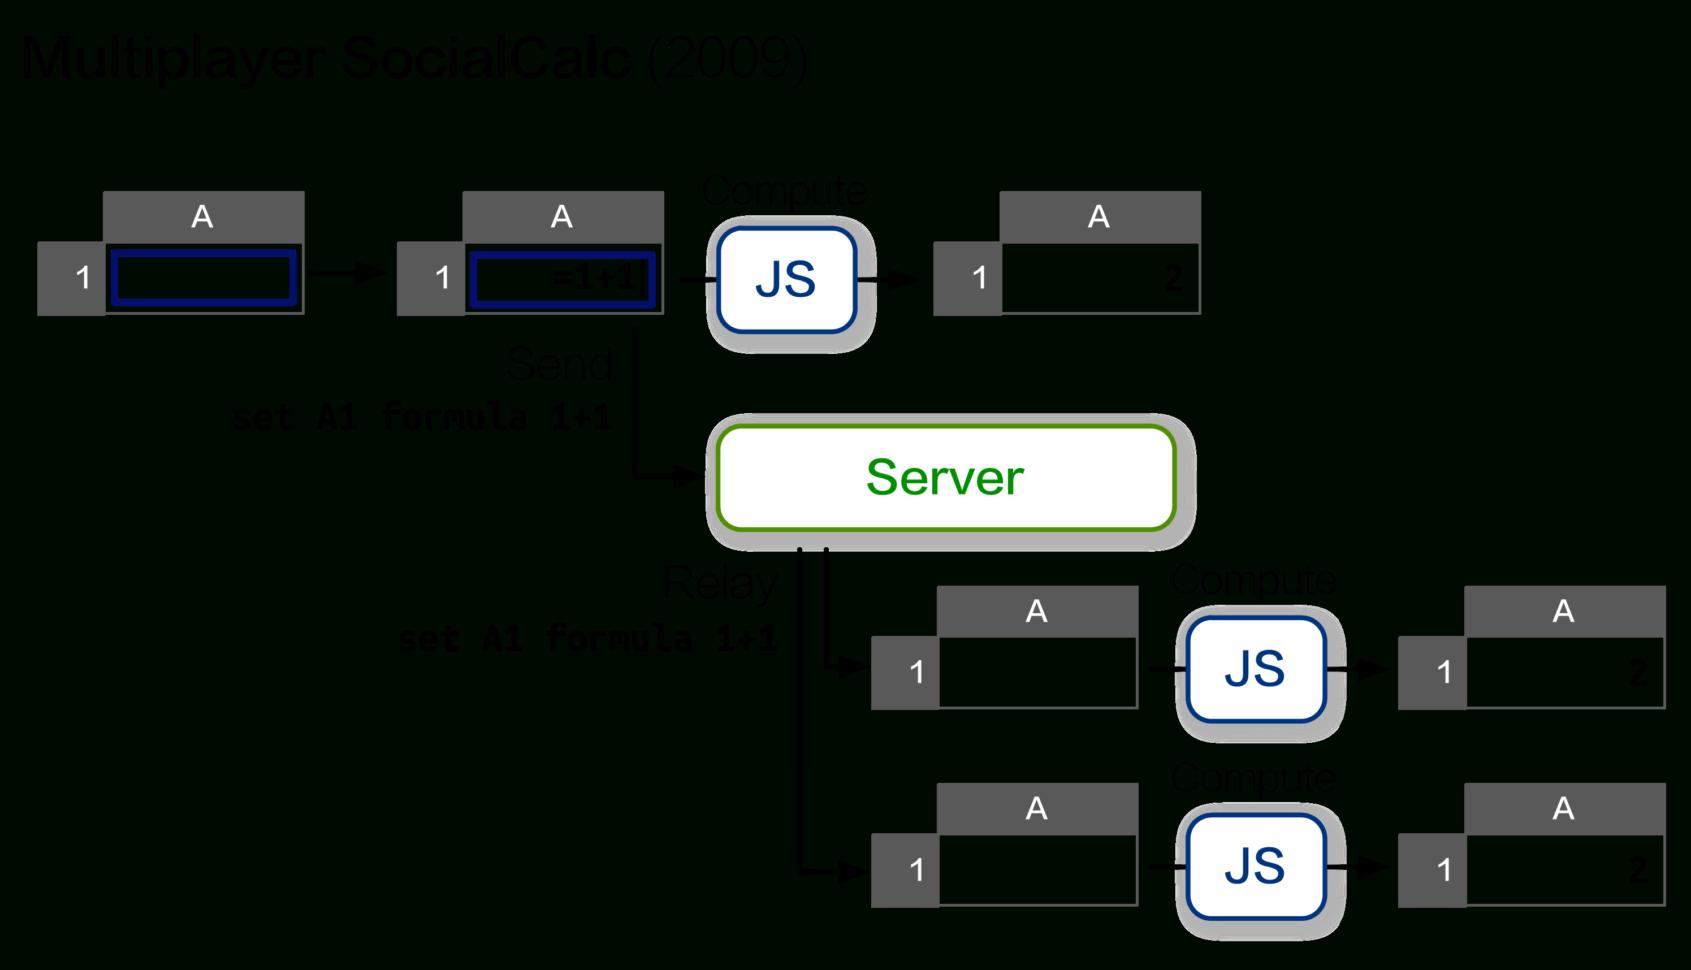 javascript spreadsheet open source  Javascript Spreadsheet Open Source Intended For Ethercalc Javascript Spreadsheet Open Source Payment Spreadshee